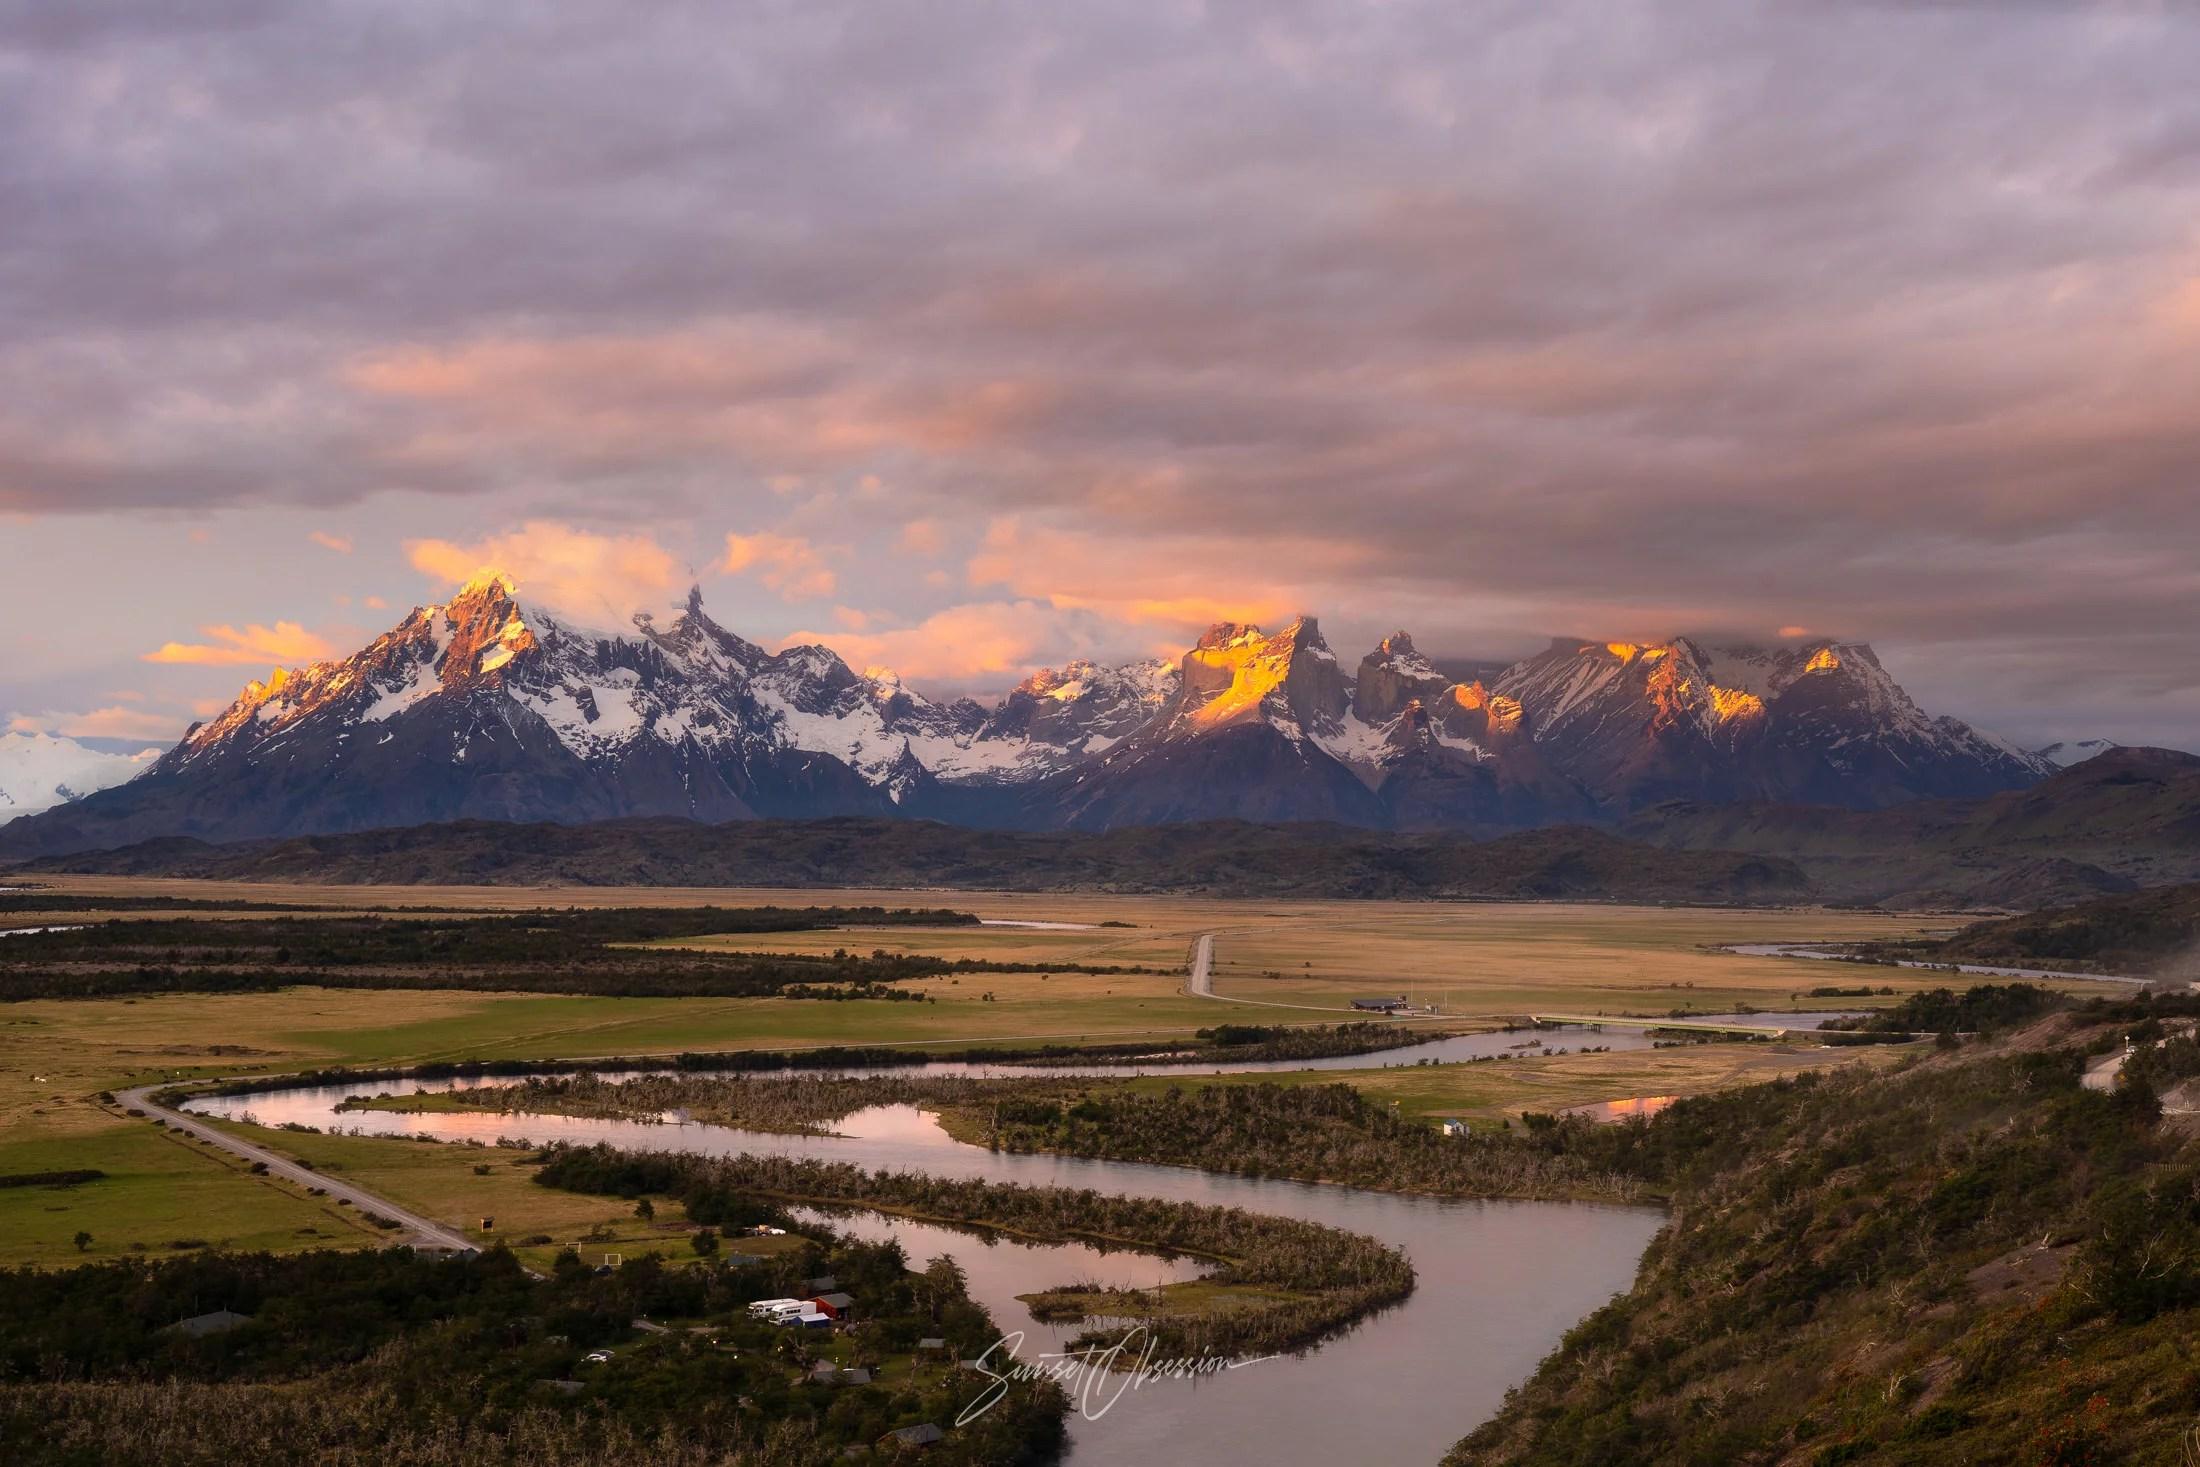 Sunset over Torres del Paine National Park